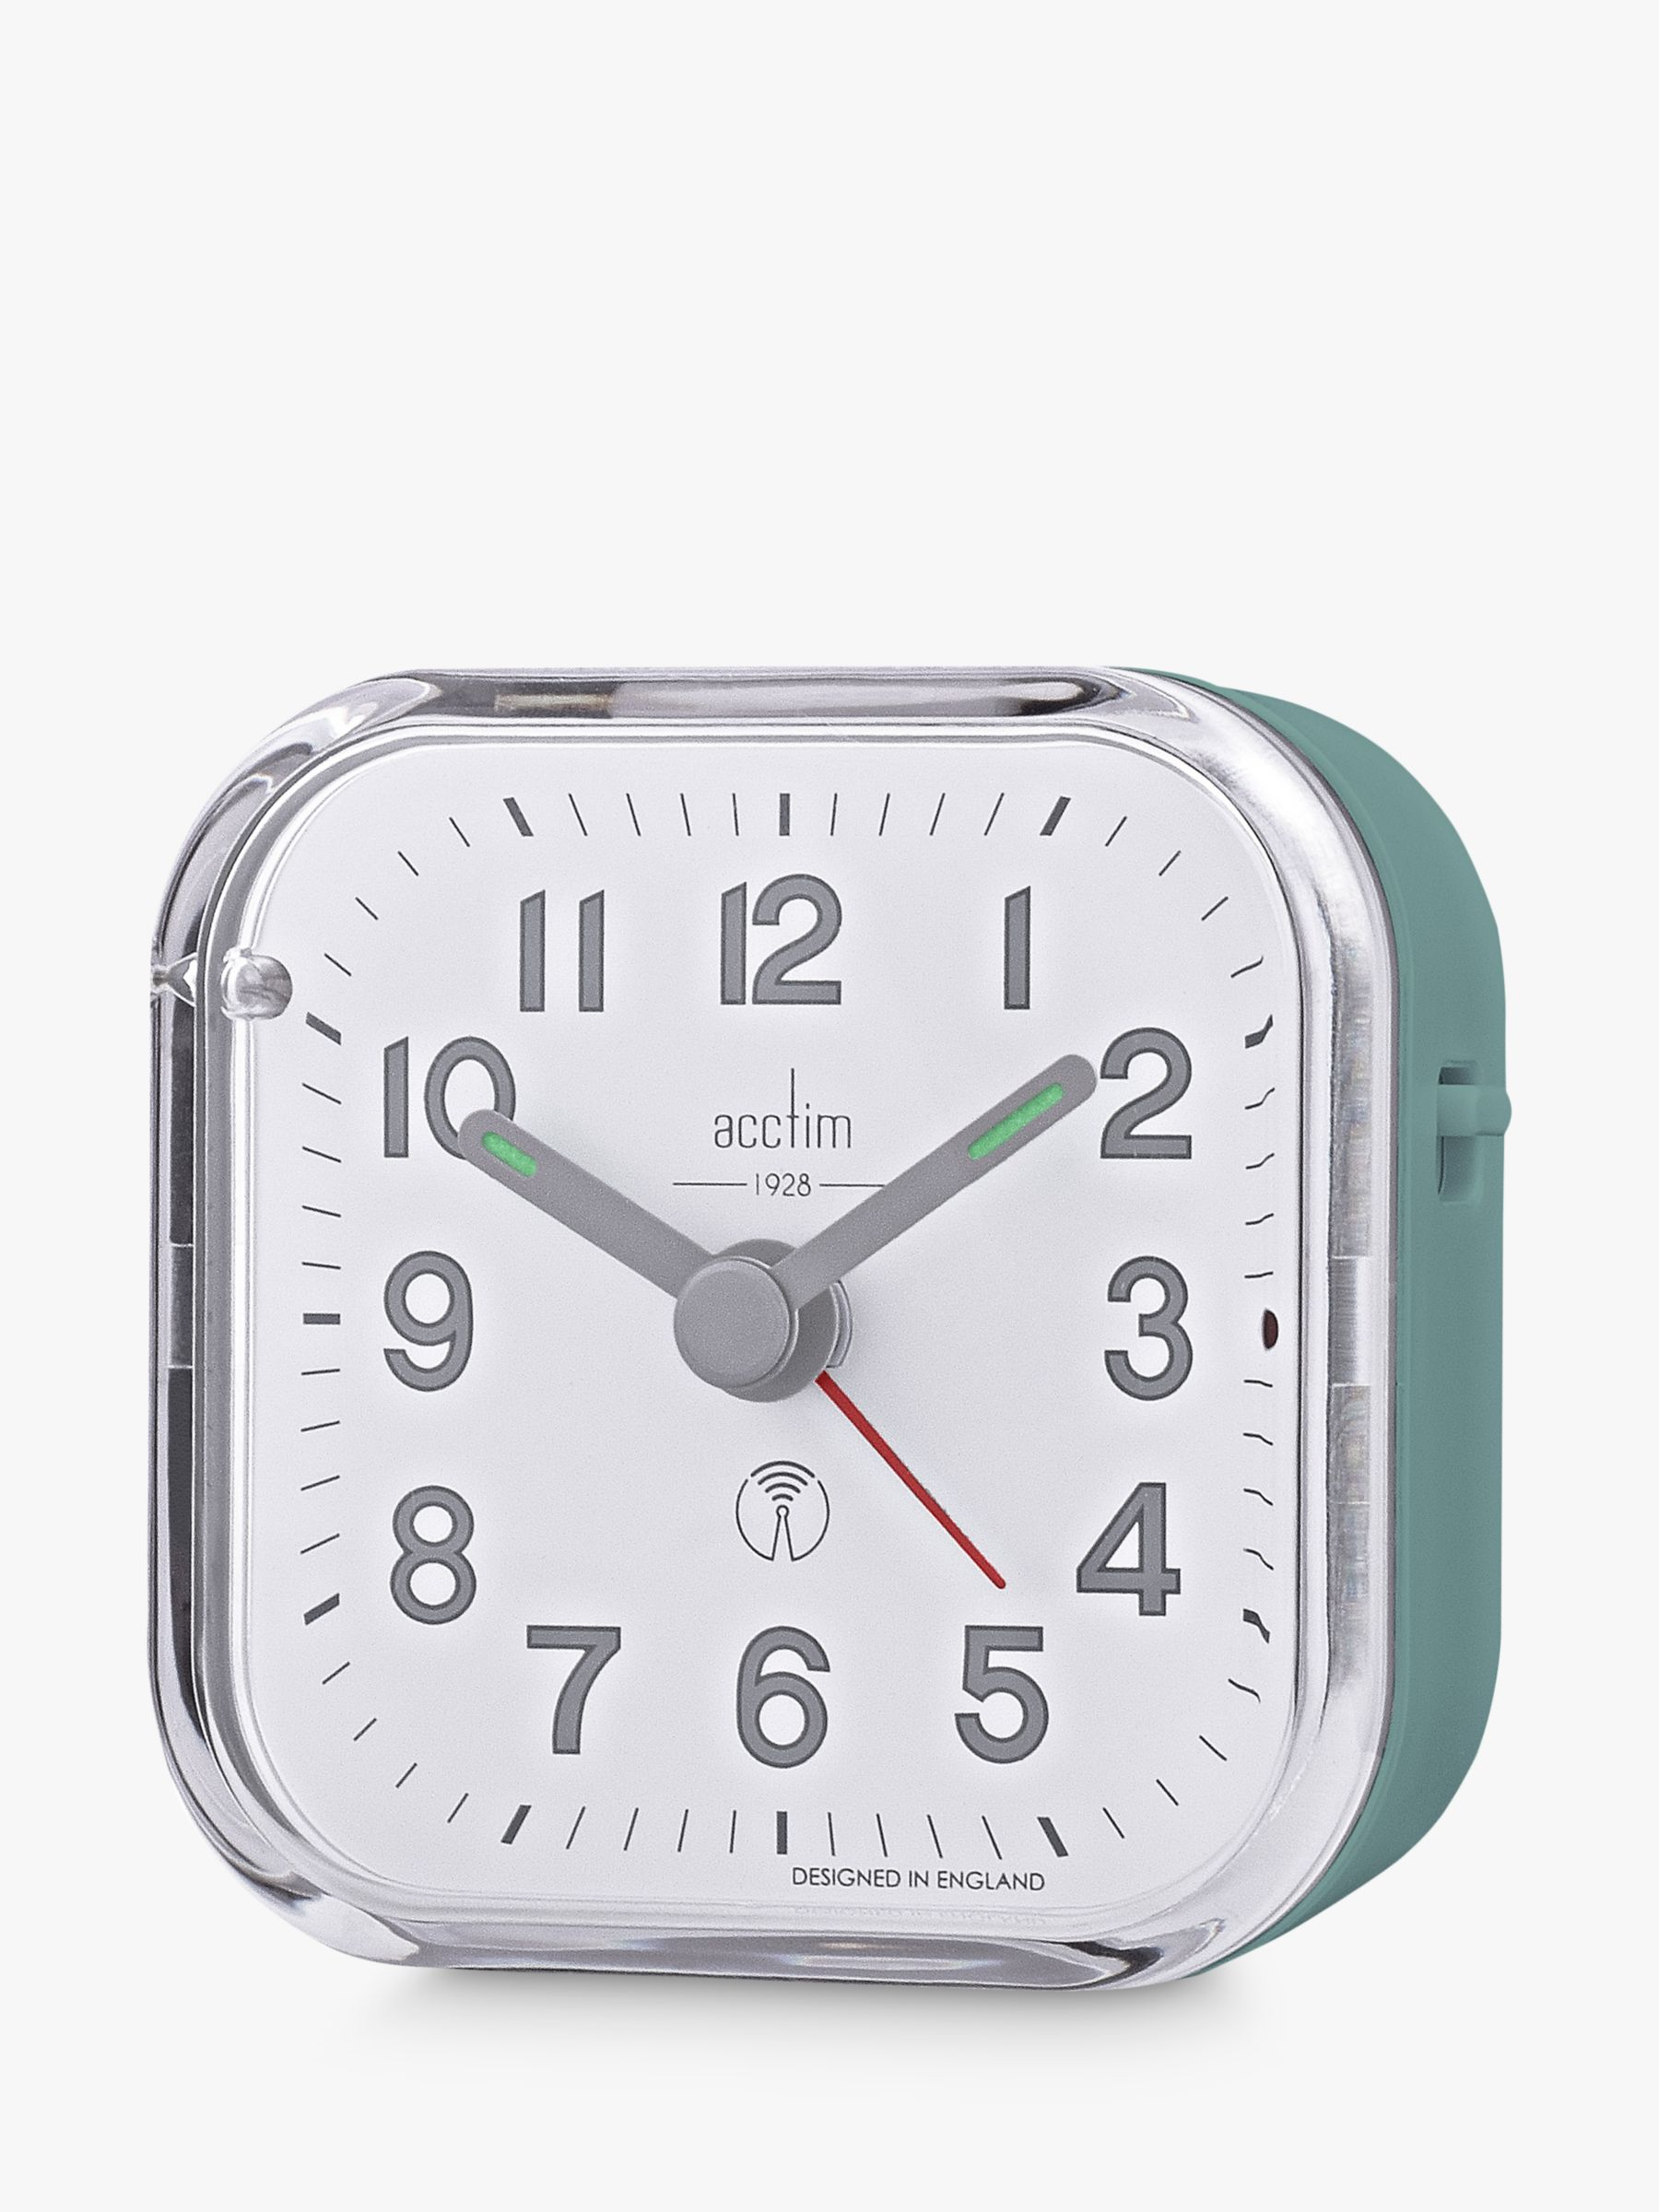 Acctim Acctim Radio Controlled Analogue Alarm Clock, Moss Green